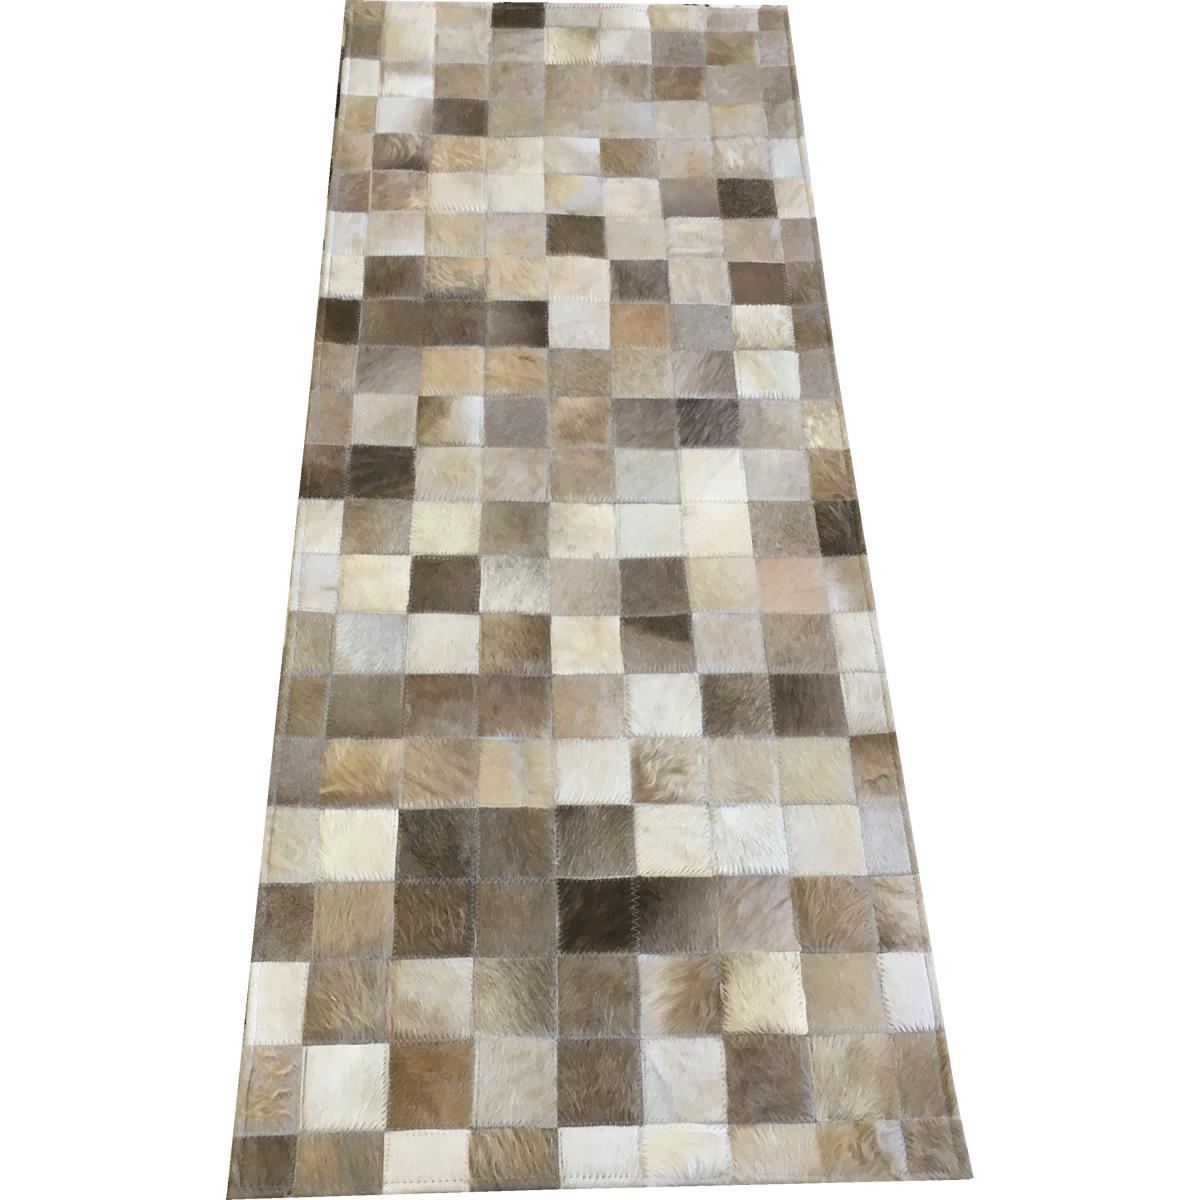 Tapete de couro passadeira cinza natural 0,60x1,50 sem borda